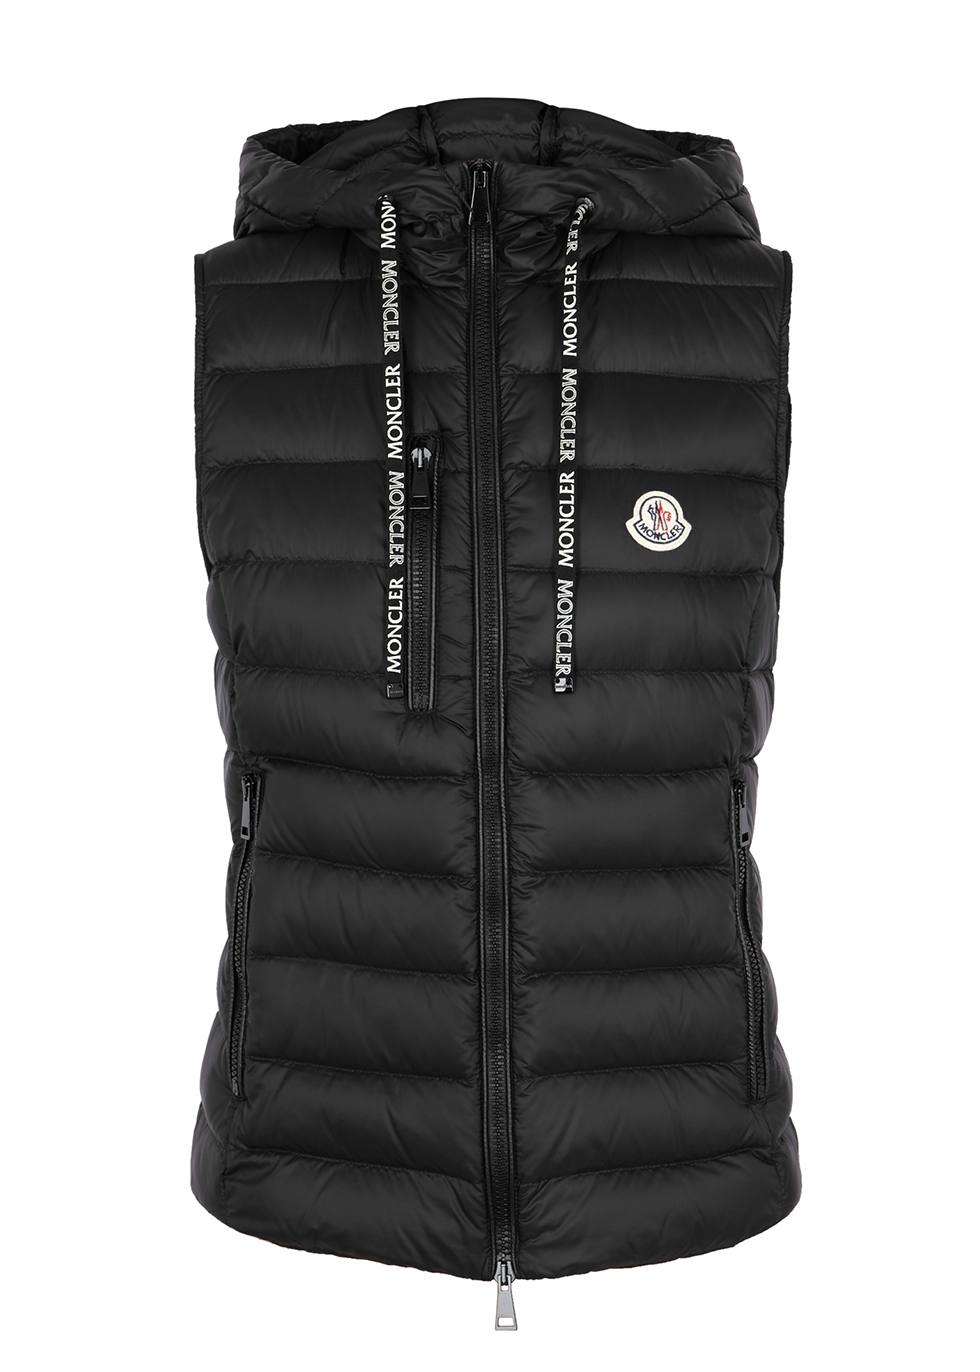 584c00db4 Moncler - Designer Jackets, Coats, Gilets - Harvey Nichols